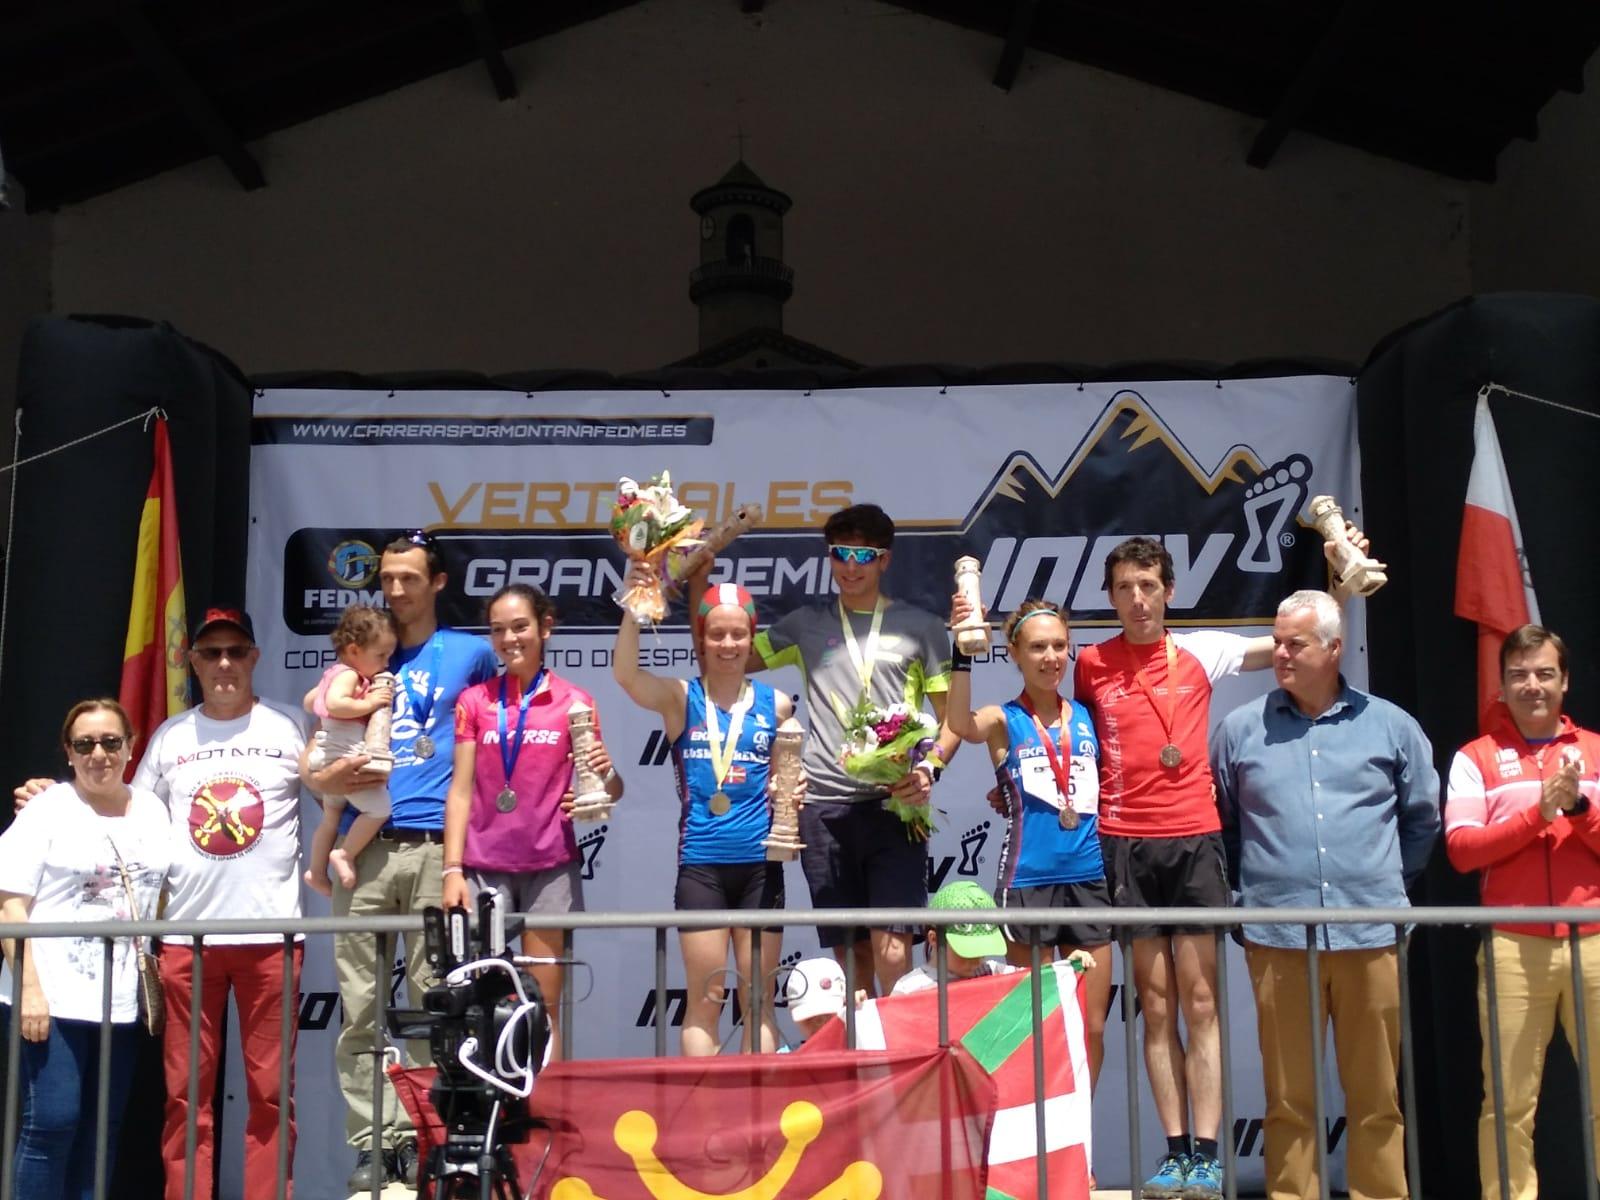 Oriol Cardona y Oihane Azkorbebeitia ganadores del Campeonatode España de Carreras por Montaña Verticales FEDME - Gran Premio INOV-8